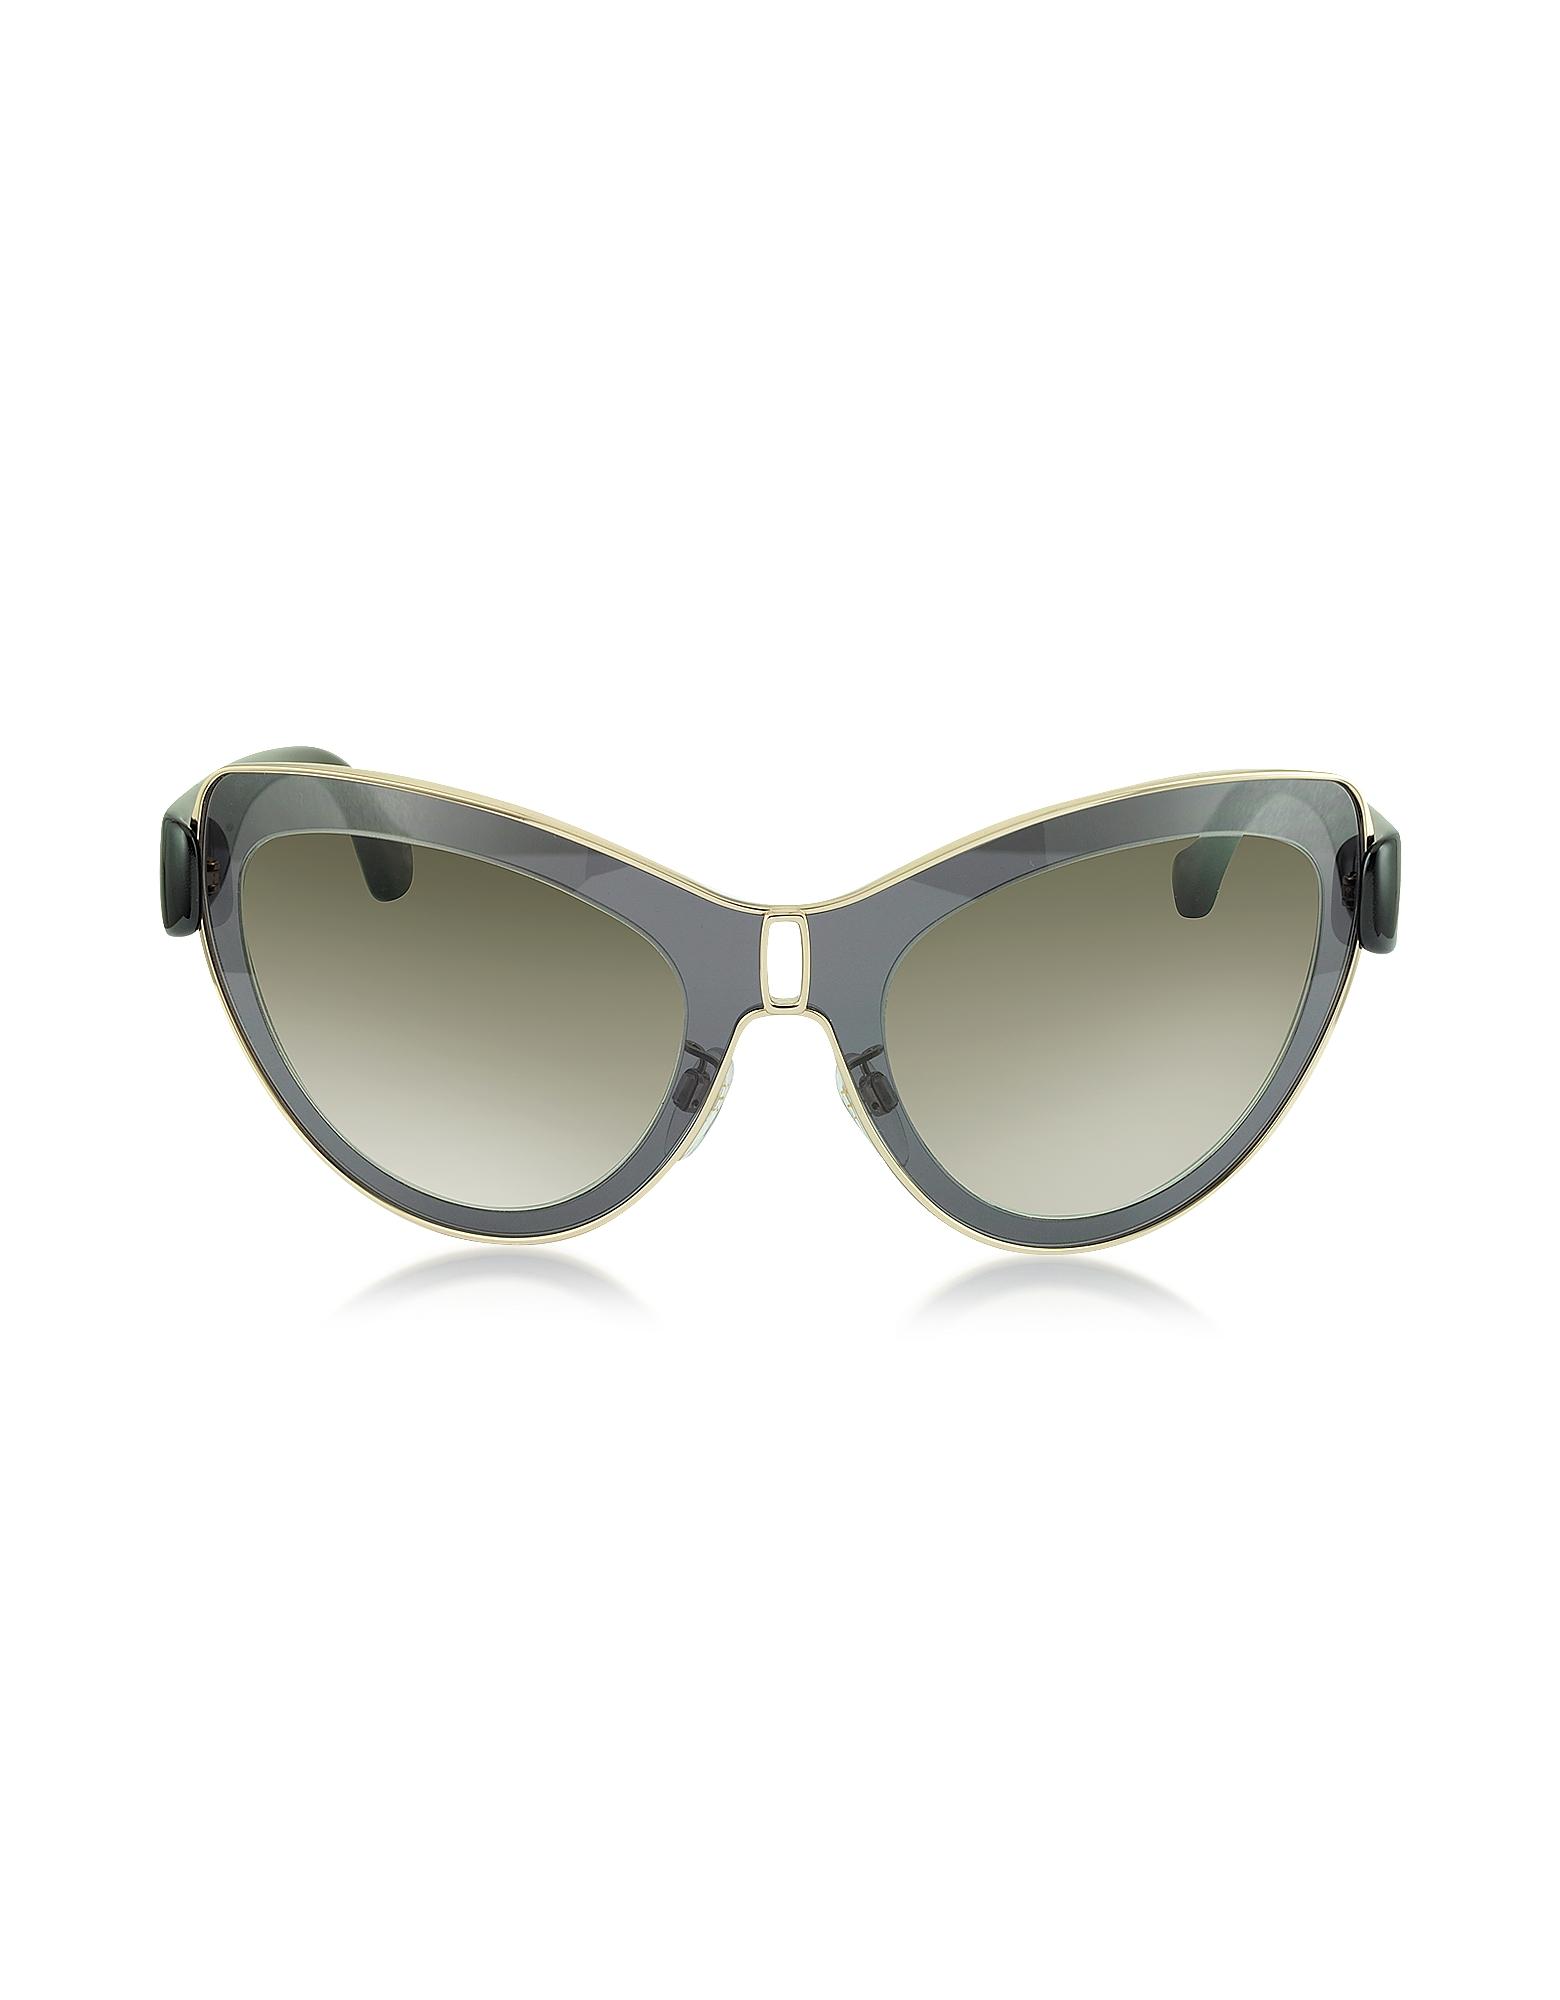 Balenciaga Sunglasses, BA0001 01F Grey Acetate & Gold Metal Cat Eye Sunglasses